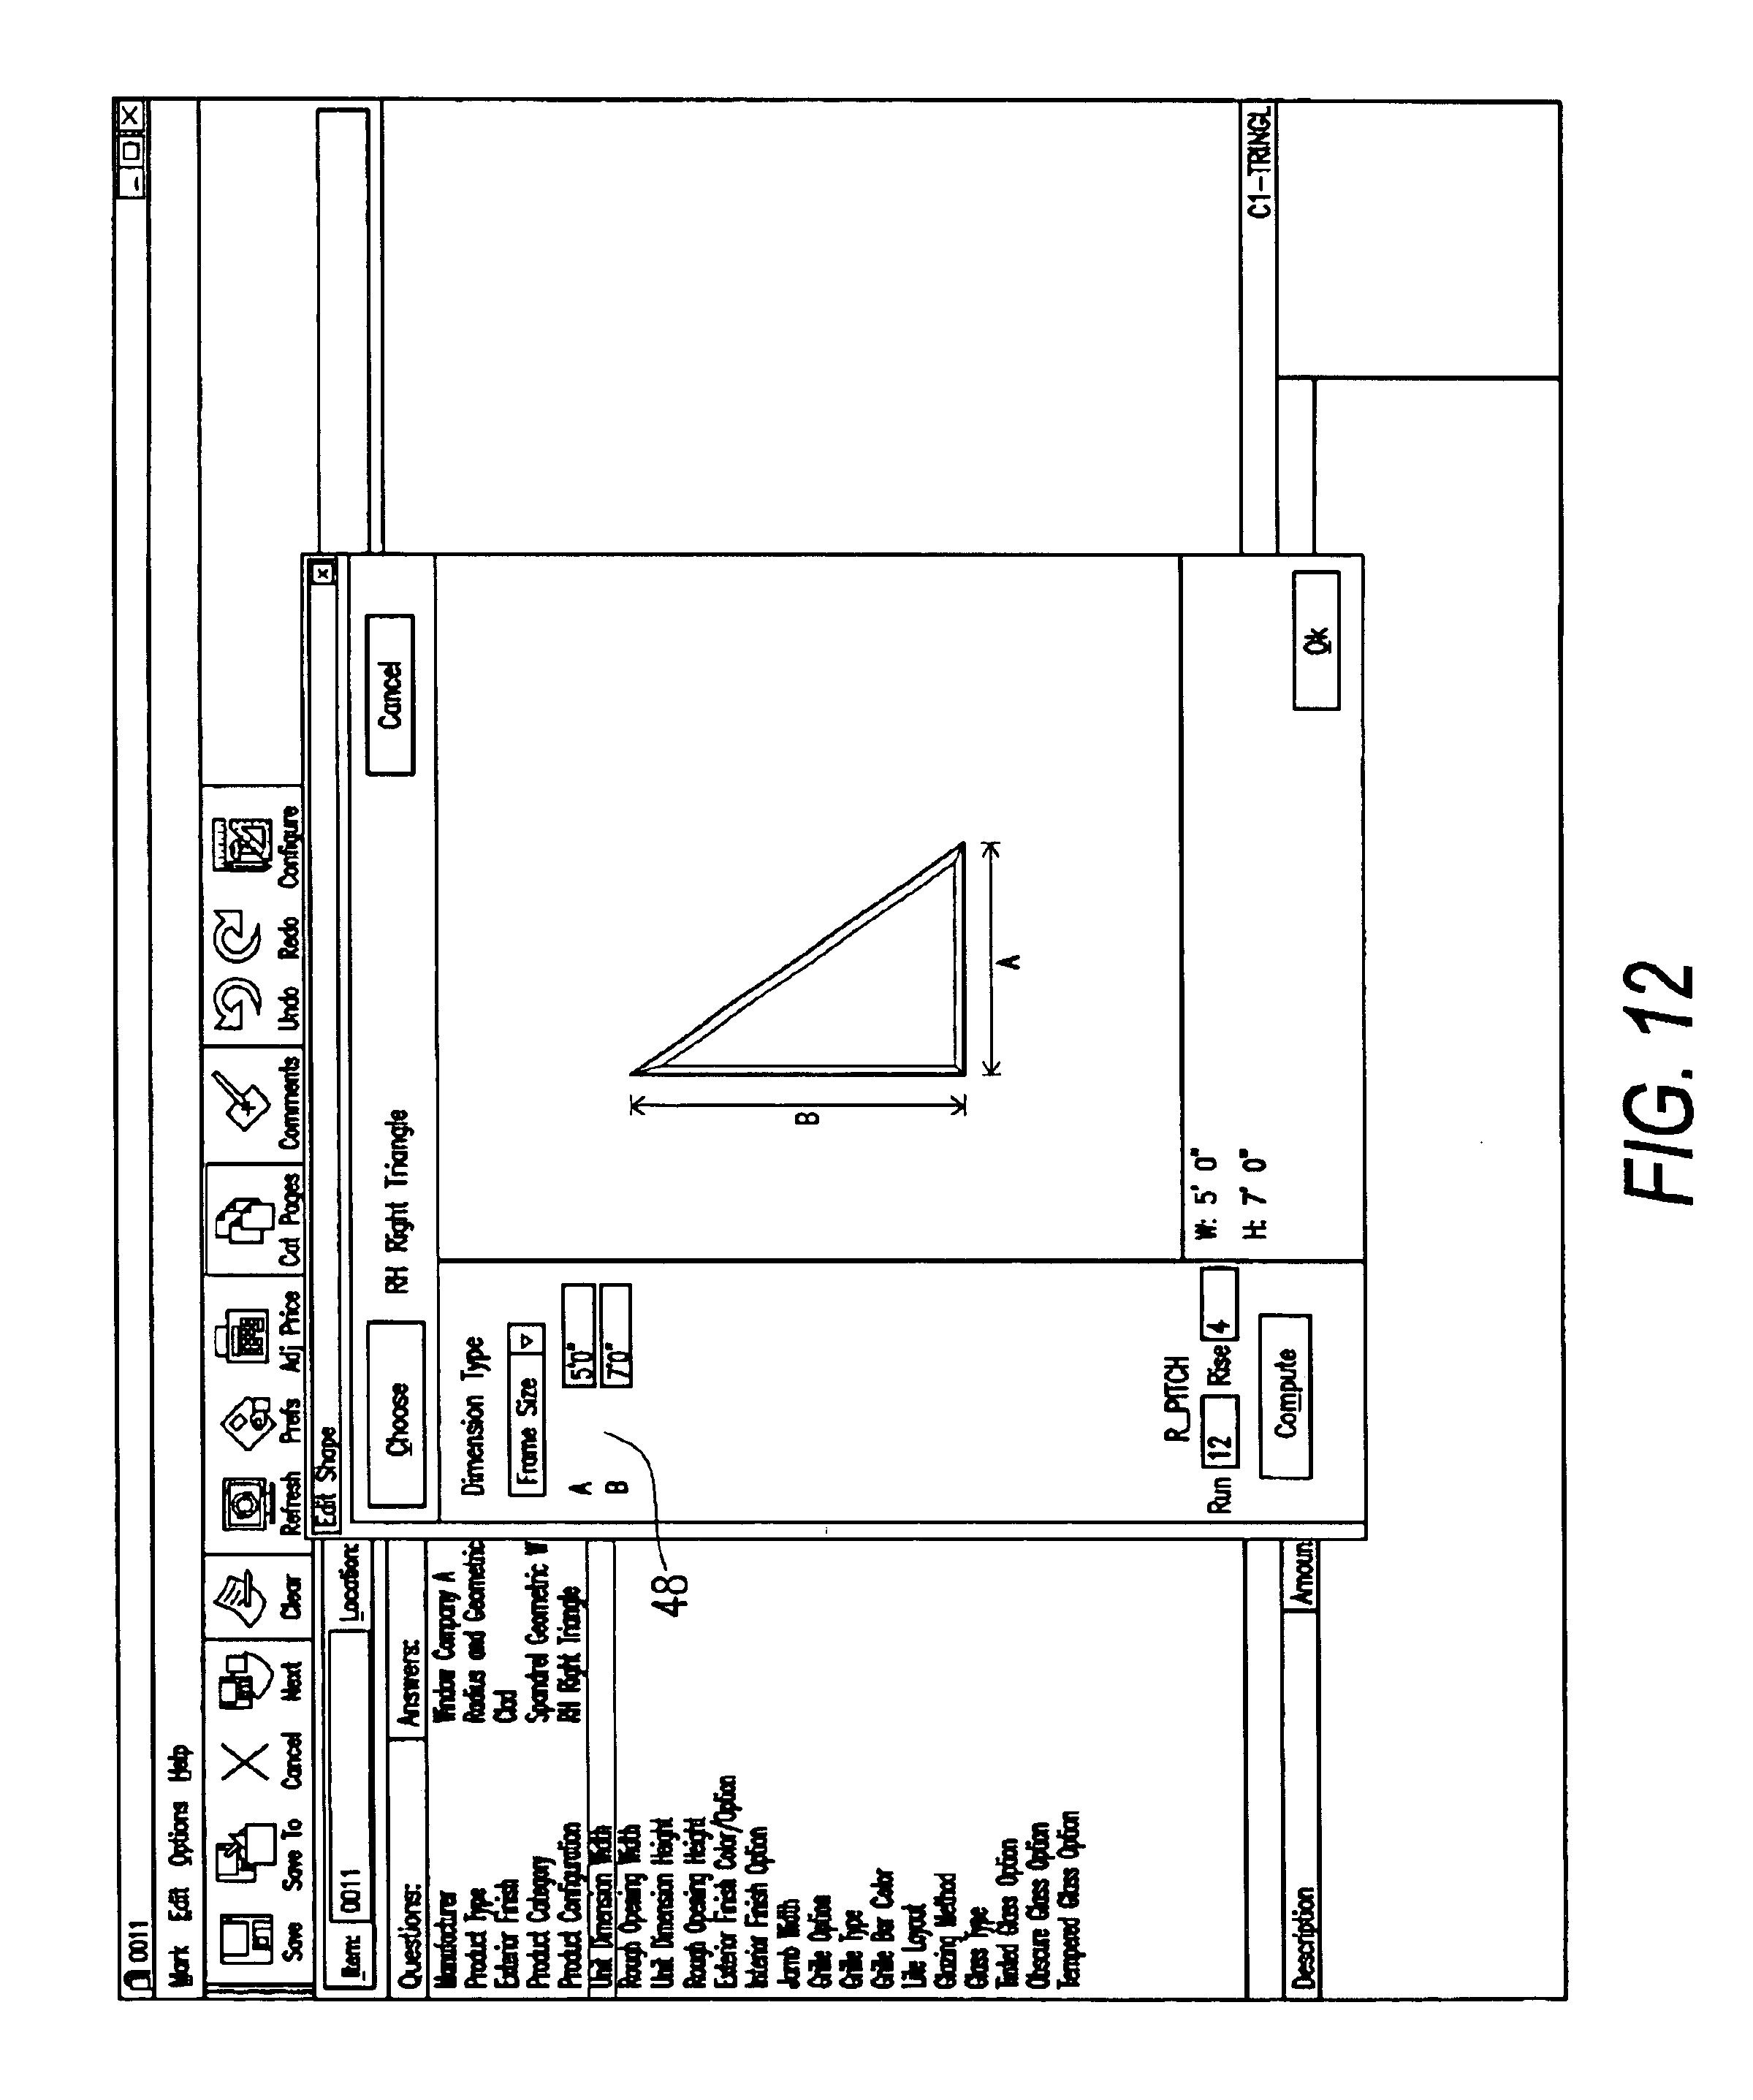 Casement Window Diagram : Casement window parts diagram bing images